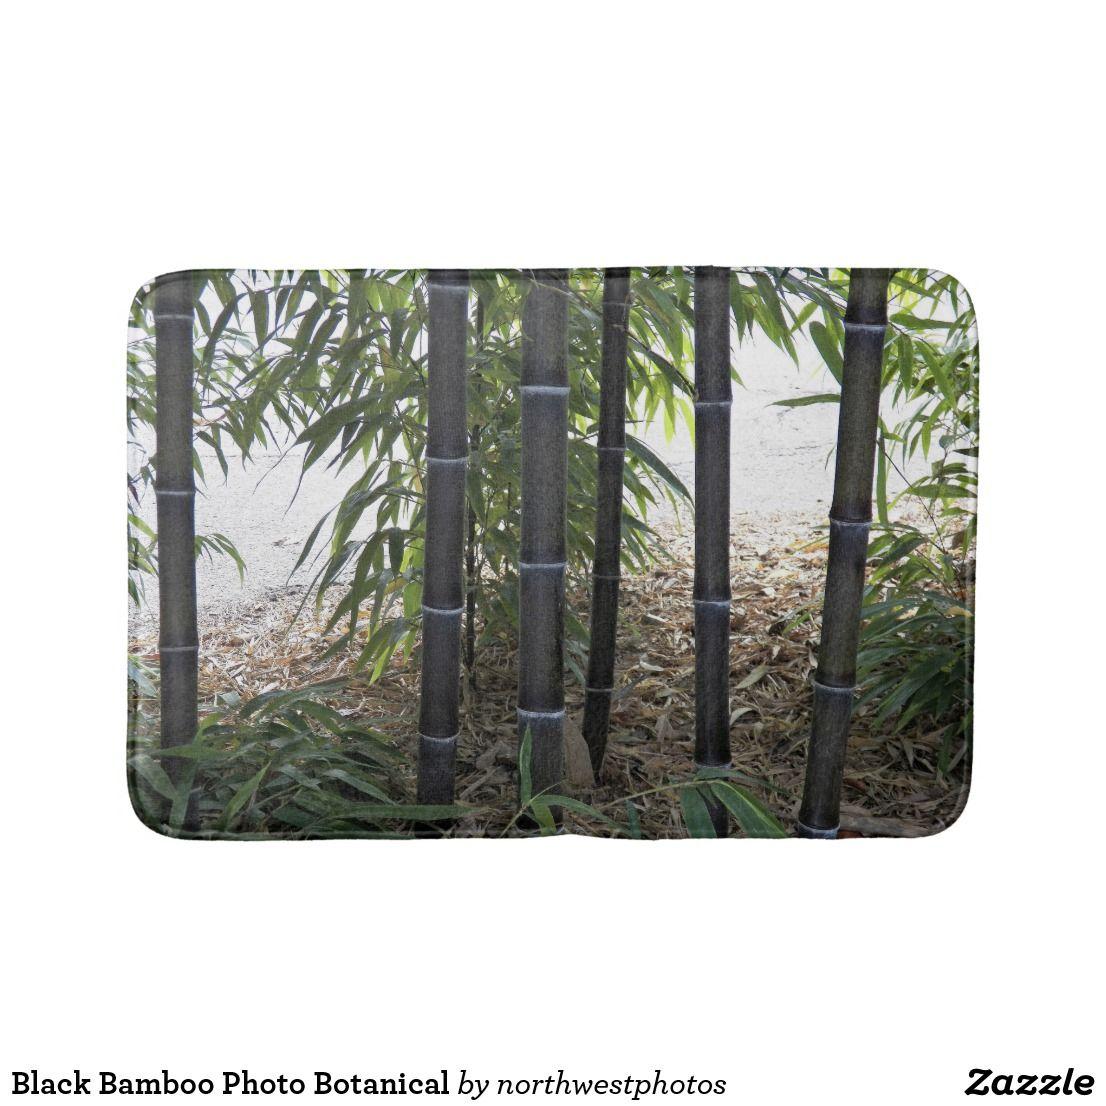 Black Bamboo Photo Botanical Bath Mat Zazzle Com Black Bamboo